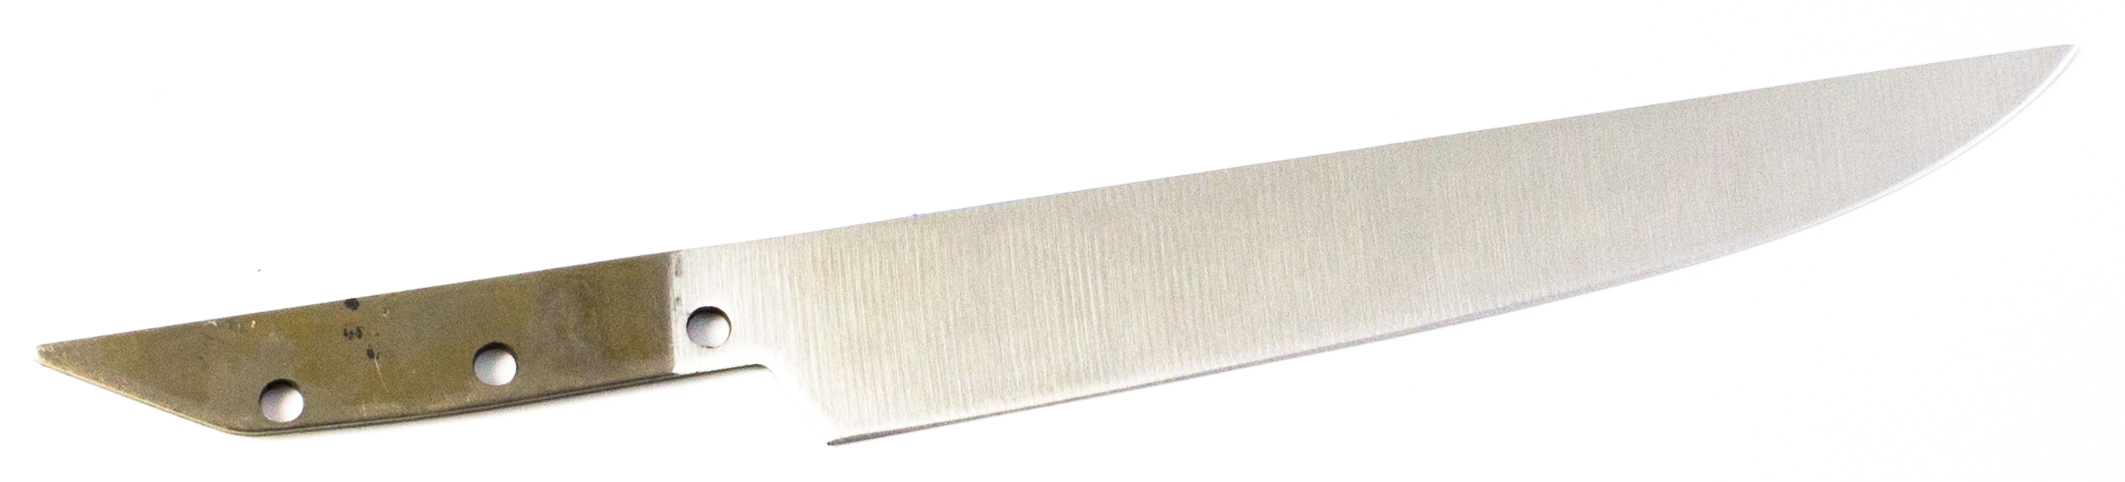 haushaltsmesserklinge aus solingen k chenmesser bis 16cm kochmesserklingen solingen. Black Bedroom Furniture Sets. Home Design Ideas